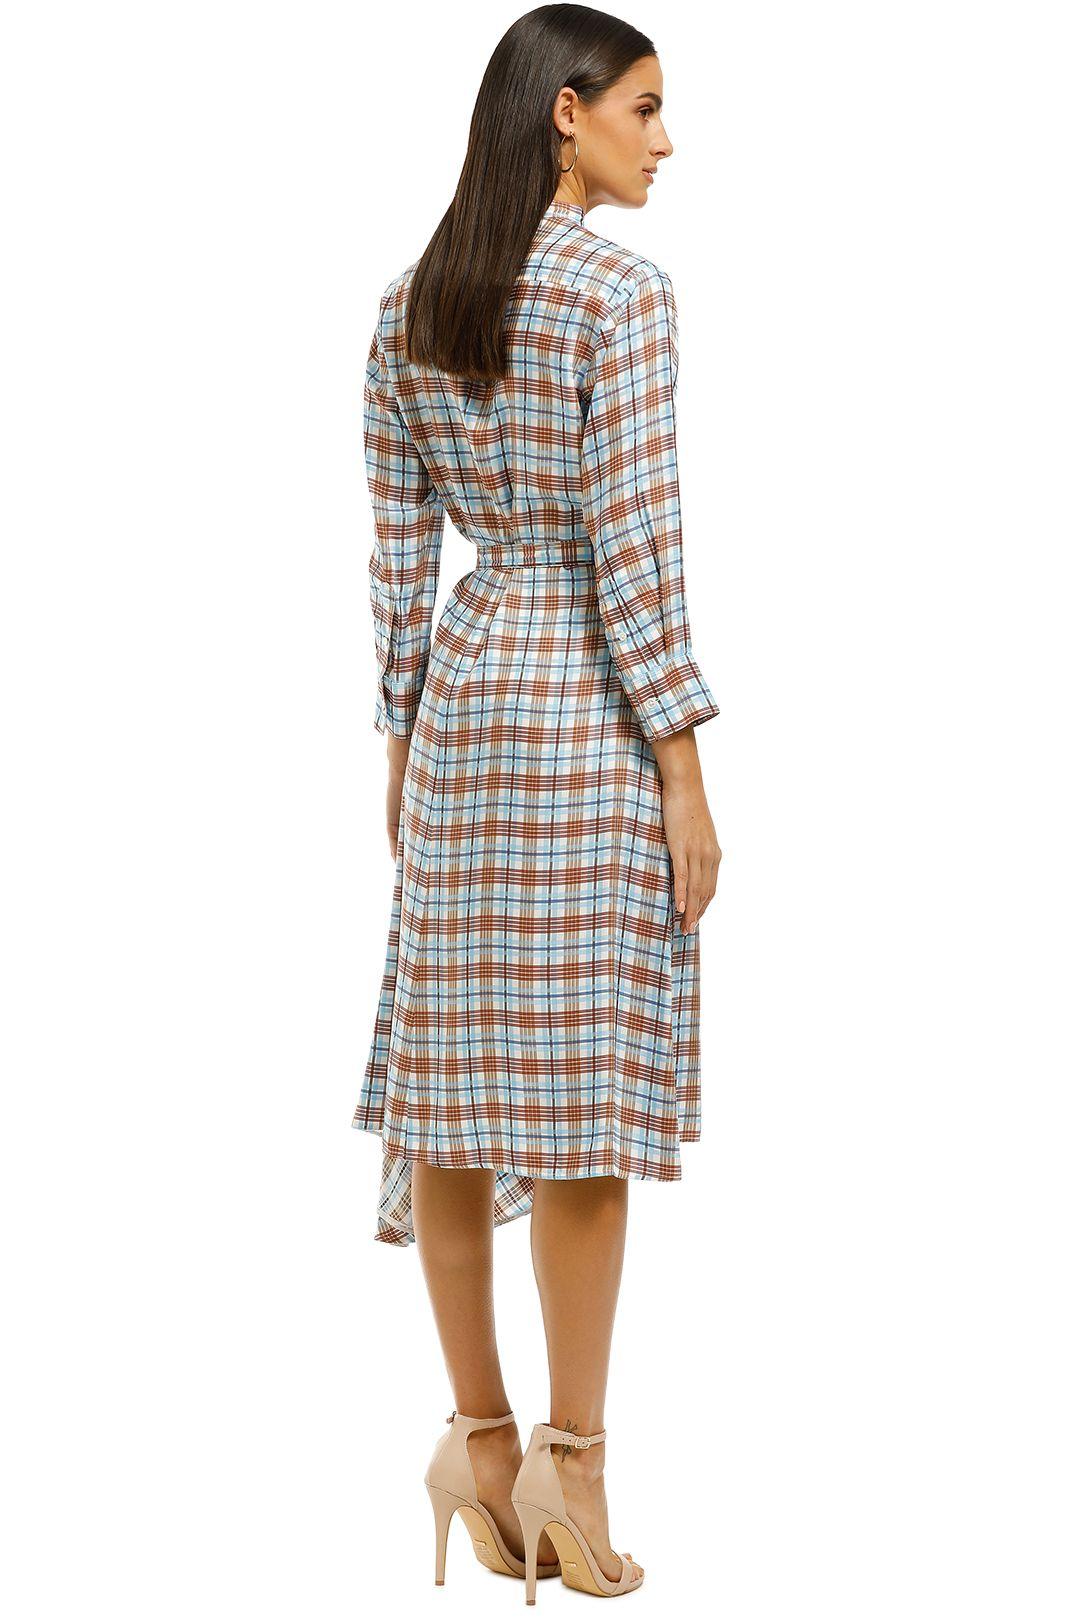 Scanlan Theodore - Check Shirt Dress - Multi - Back